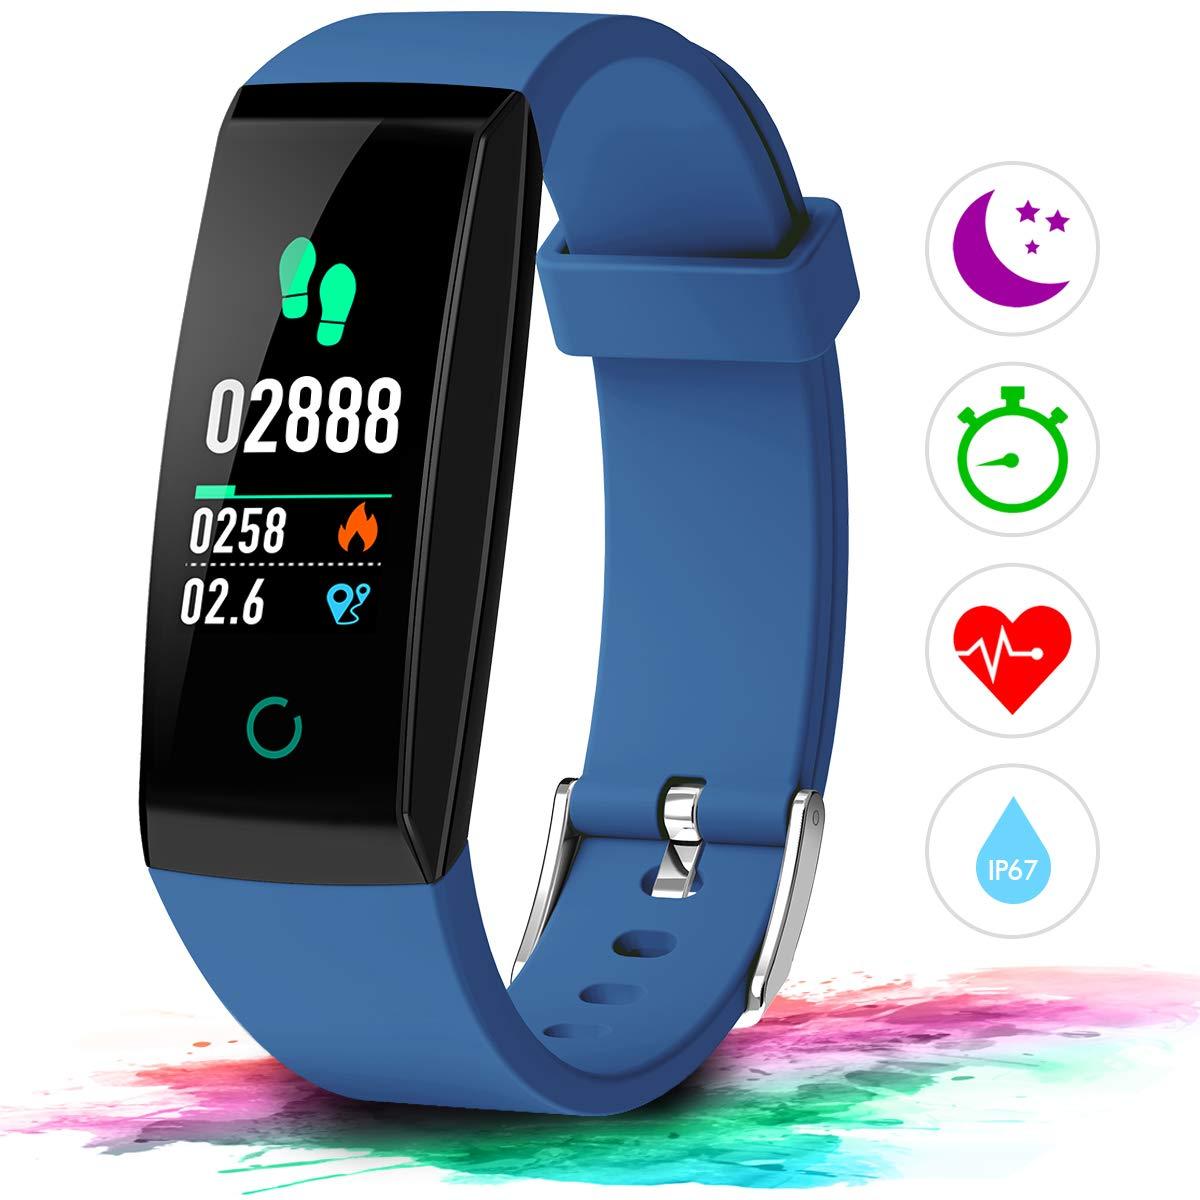 Winisok Fitness Armband Pulsmesser Fitness Tracker Wasserdicht IP67 Farbdisplay GPS Fitness Tracker Aktivitä tstracker Schrittzä hler Uhr Schlafü berwachung Anruf SMS fü r Kinder Damen Mä nner